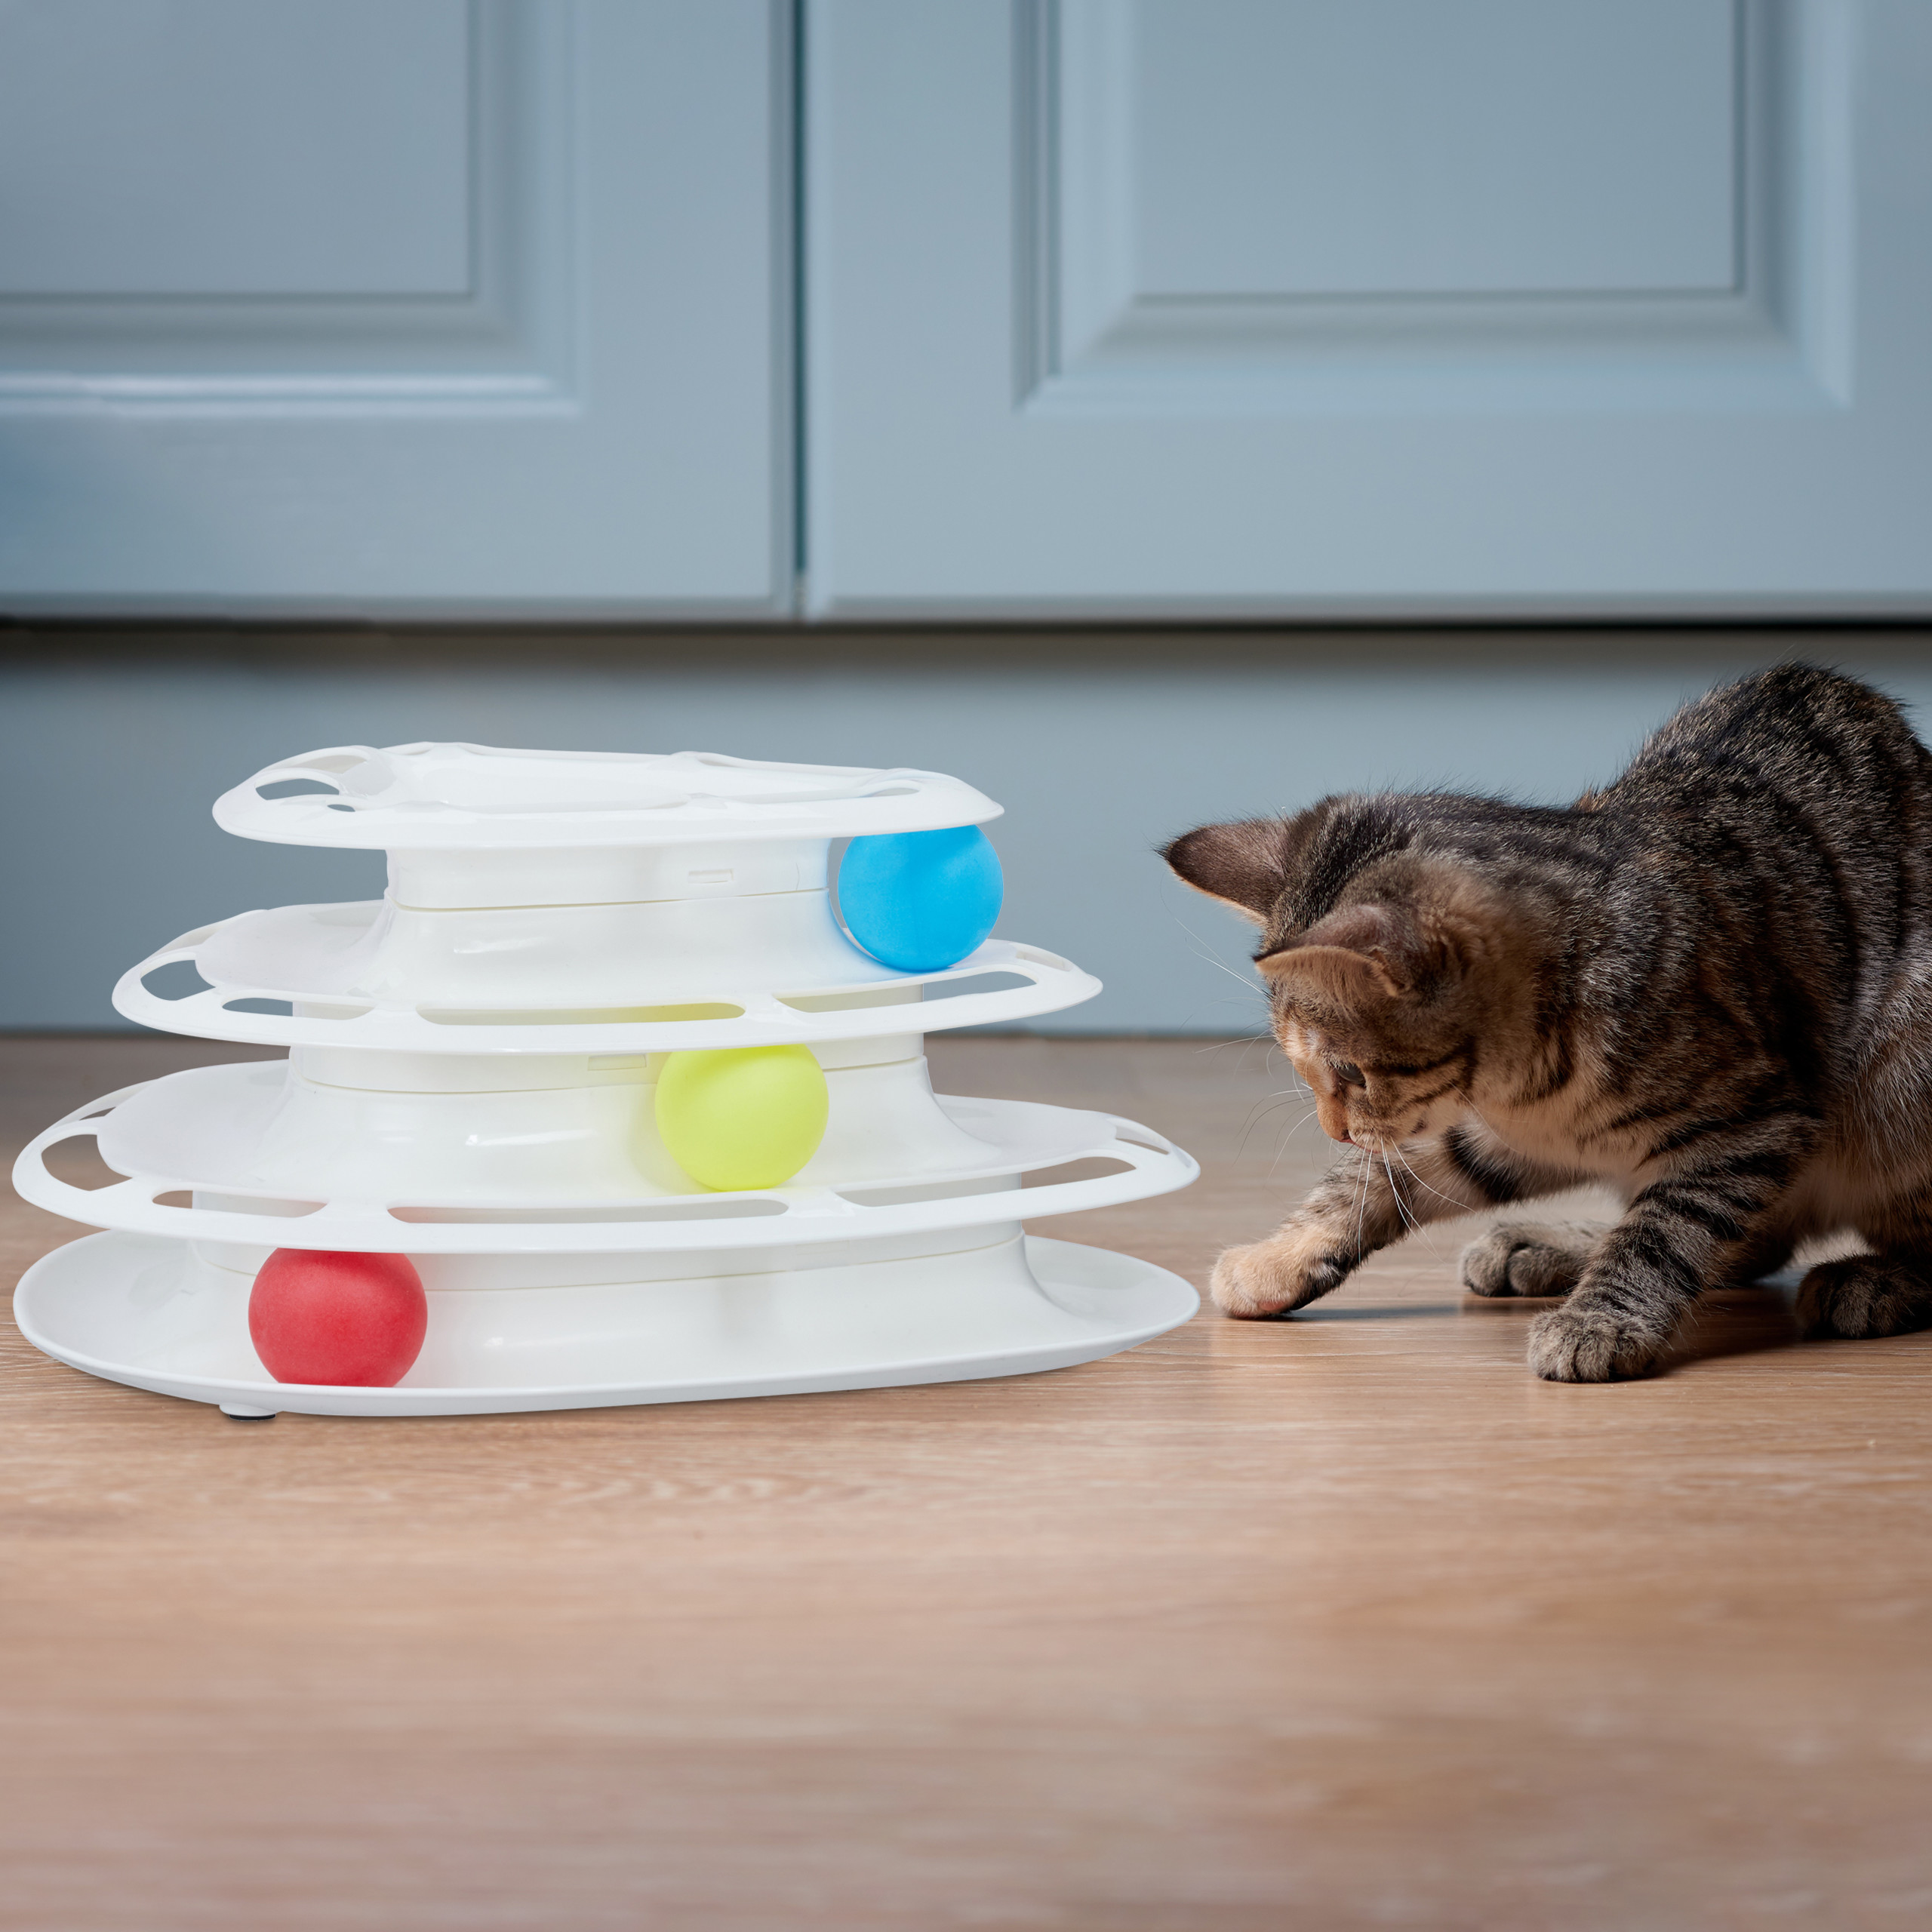 Cat-Roller-Toy-Interactive-Kitten-Teaser-3-Balls-3-Level-Tower-Track-Feline-Play thumbnail 3